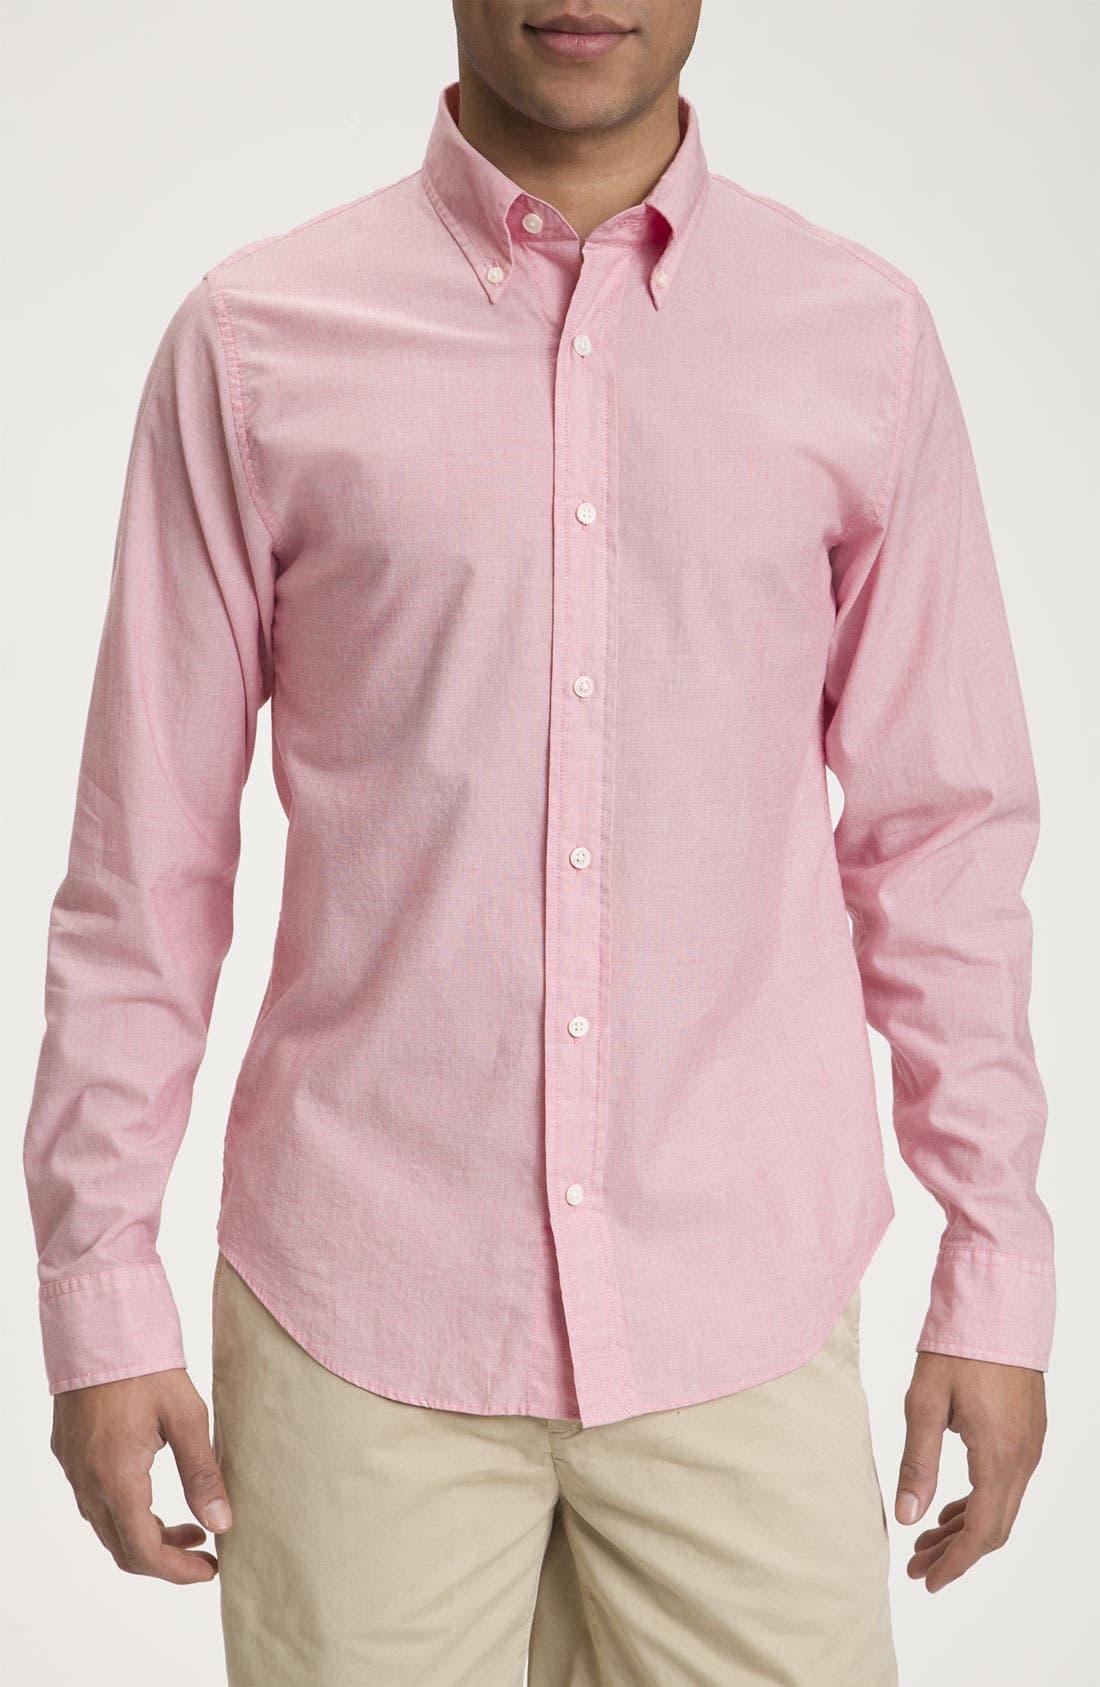 Alternate Image 1 Selected - Jack Spade 'Hawes' Woven Shirt